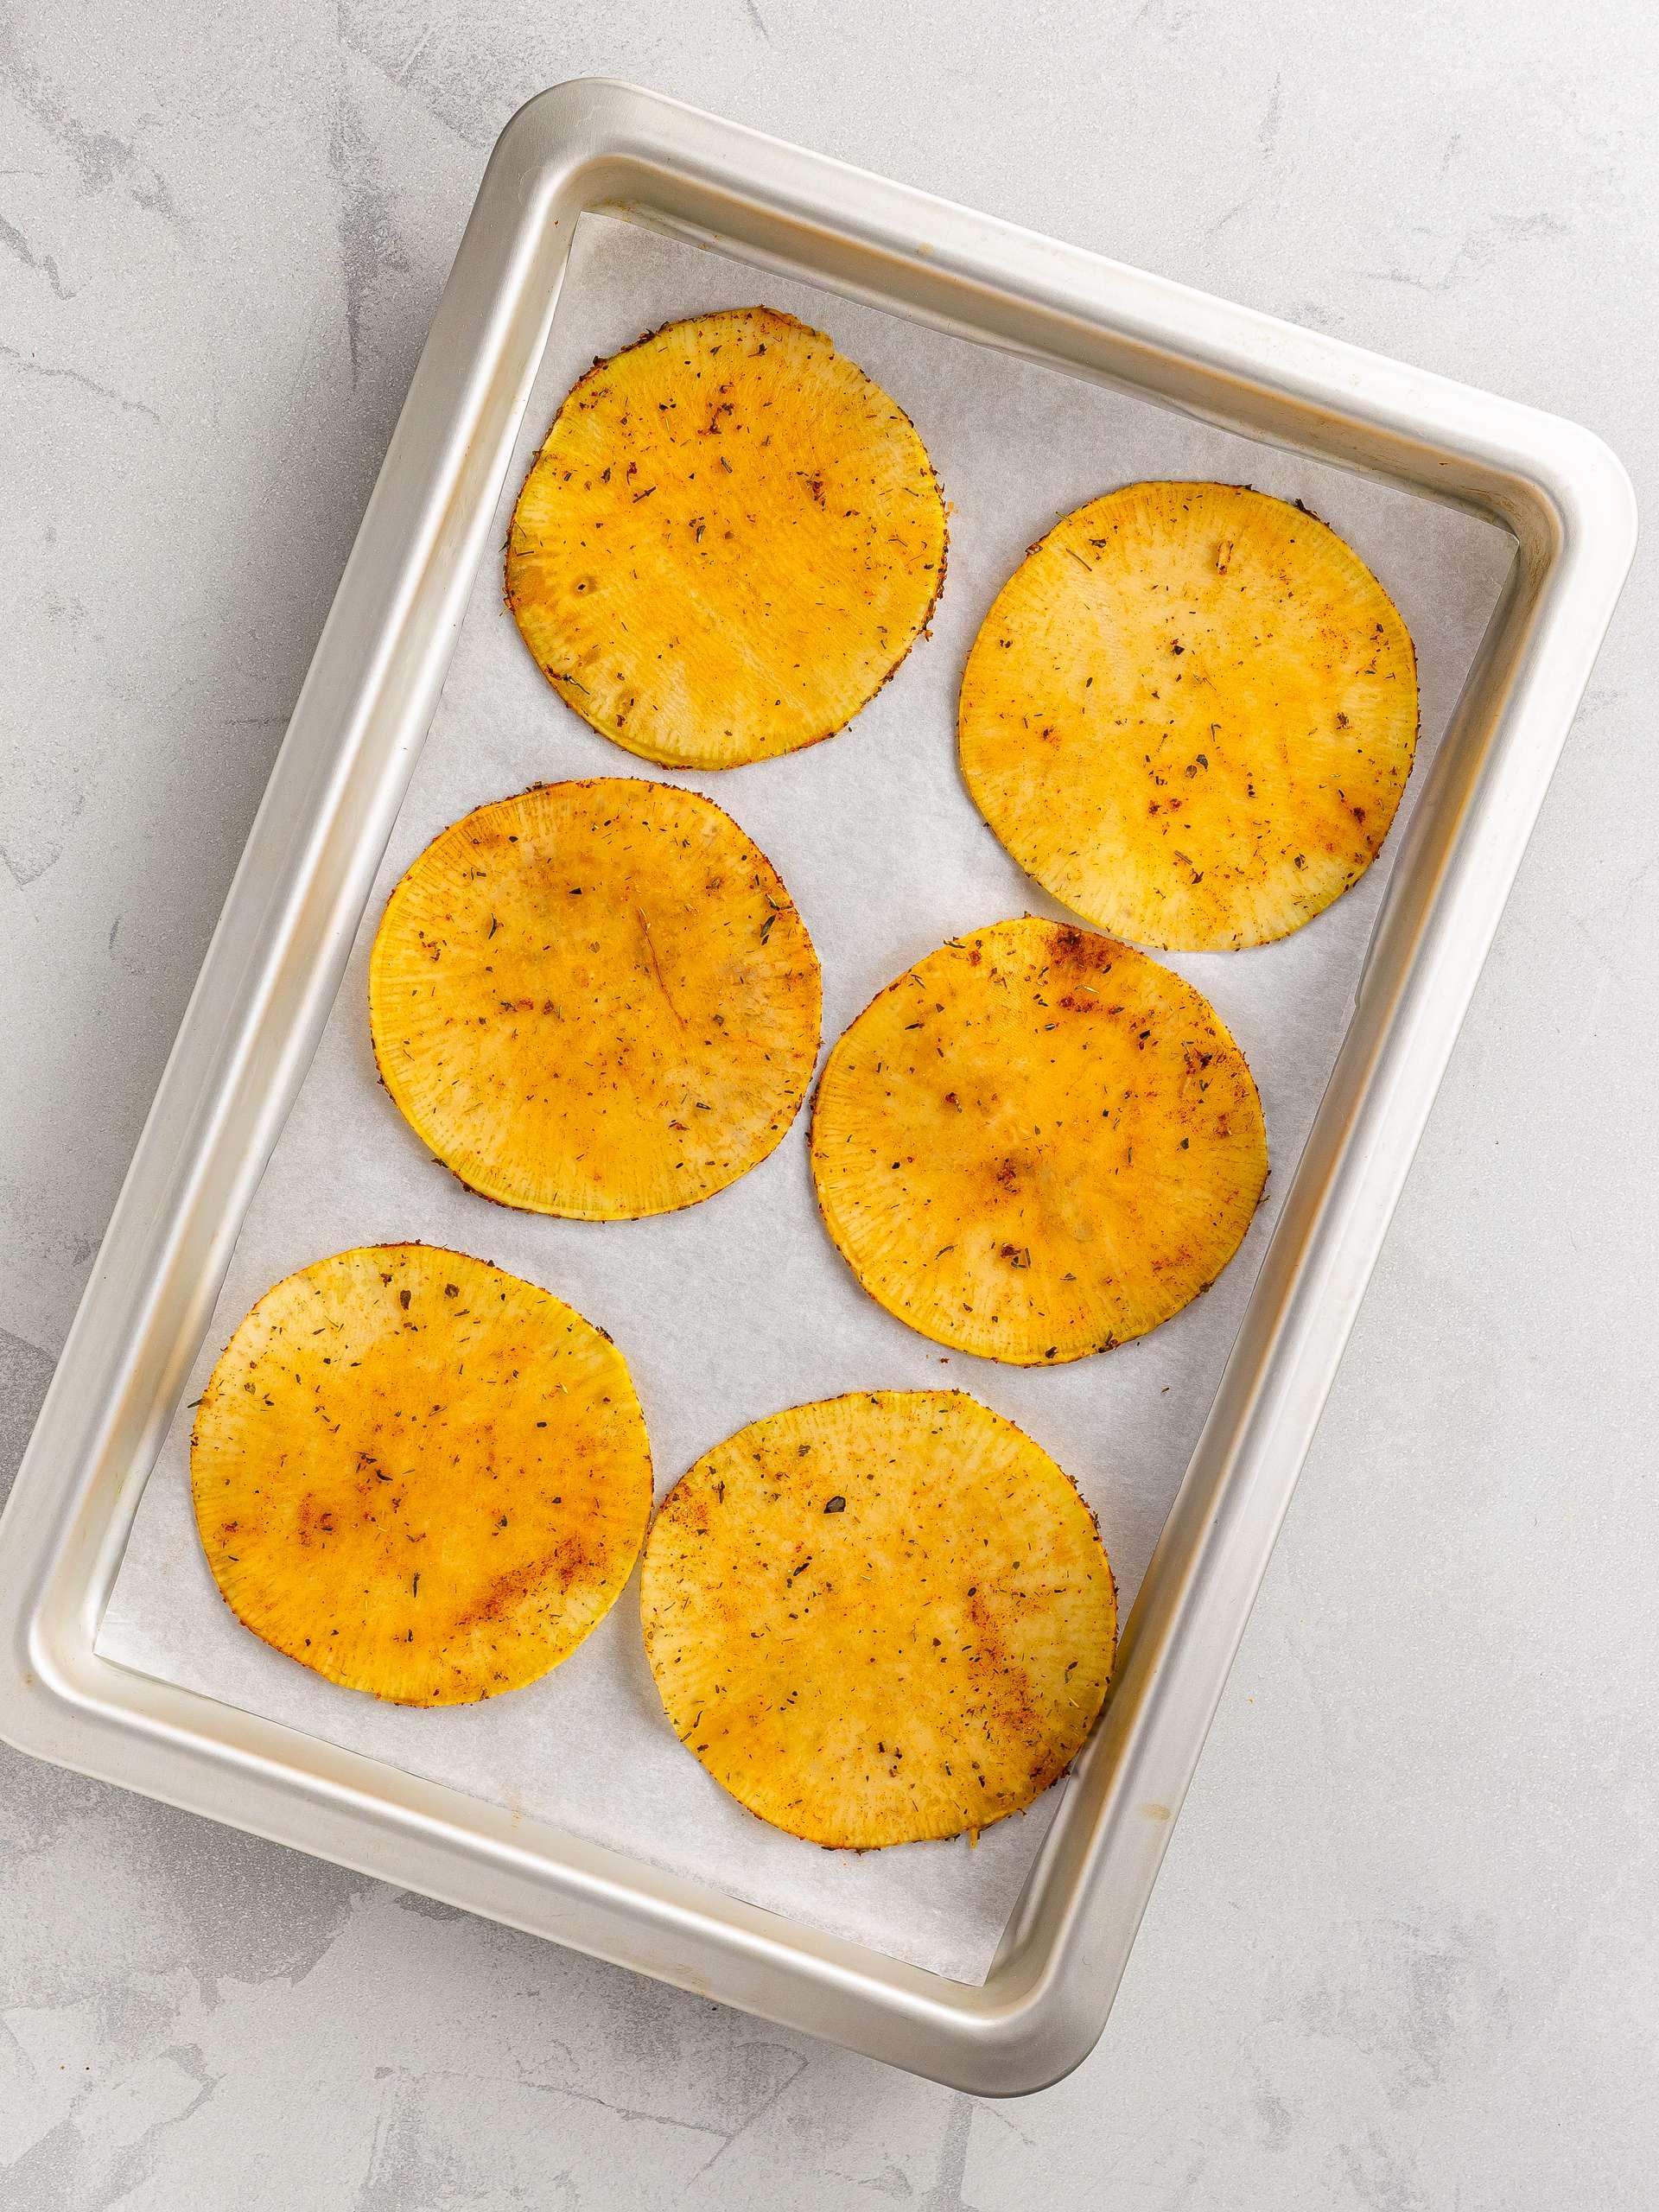 rutabaga chips on a baking tray